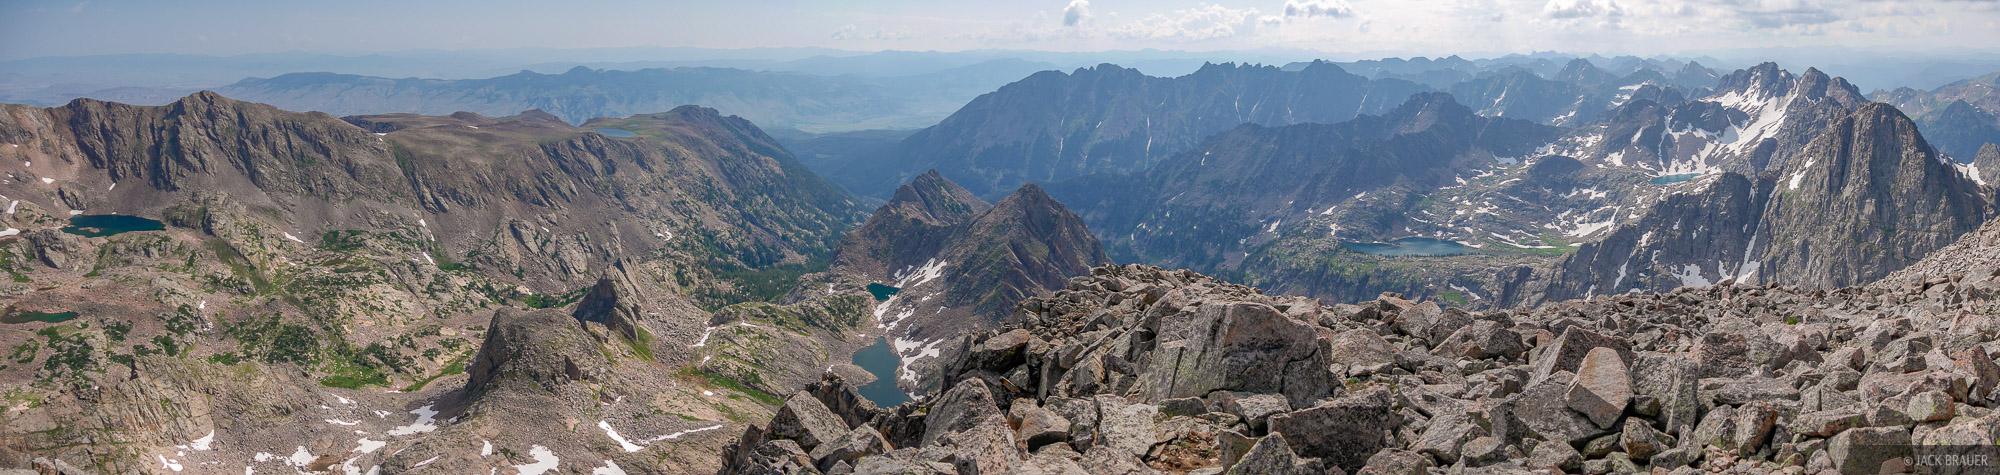 Colorado, Gore Range, Mount Powell, Eagles Nest Wilderness, photo